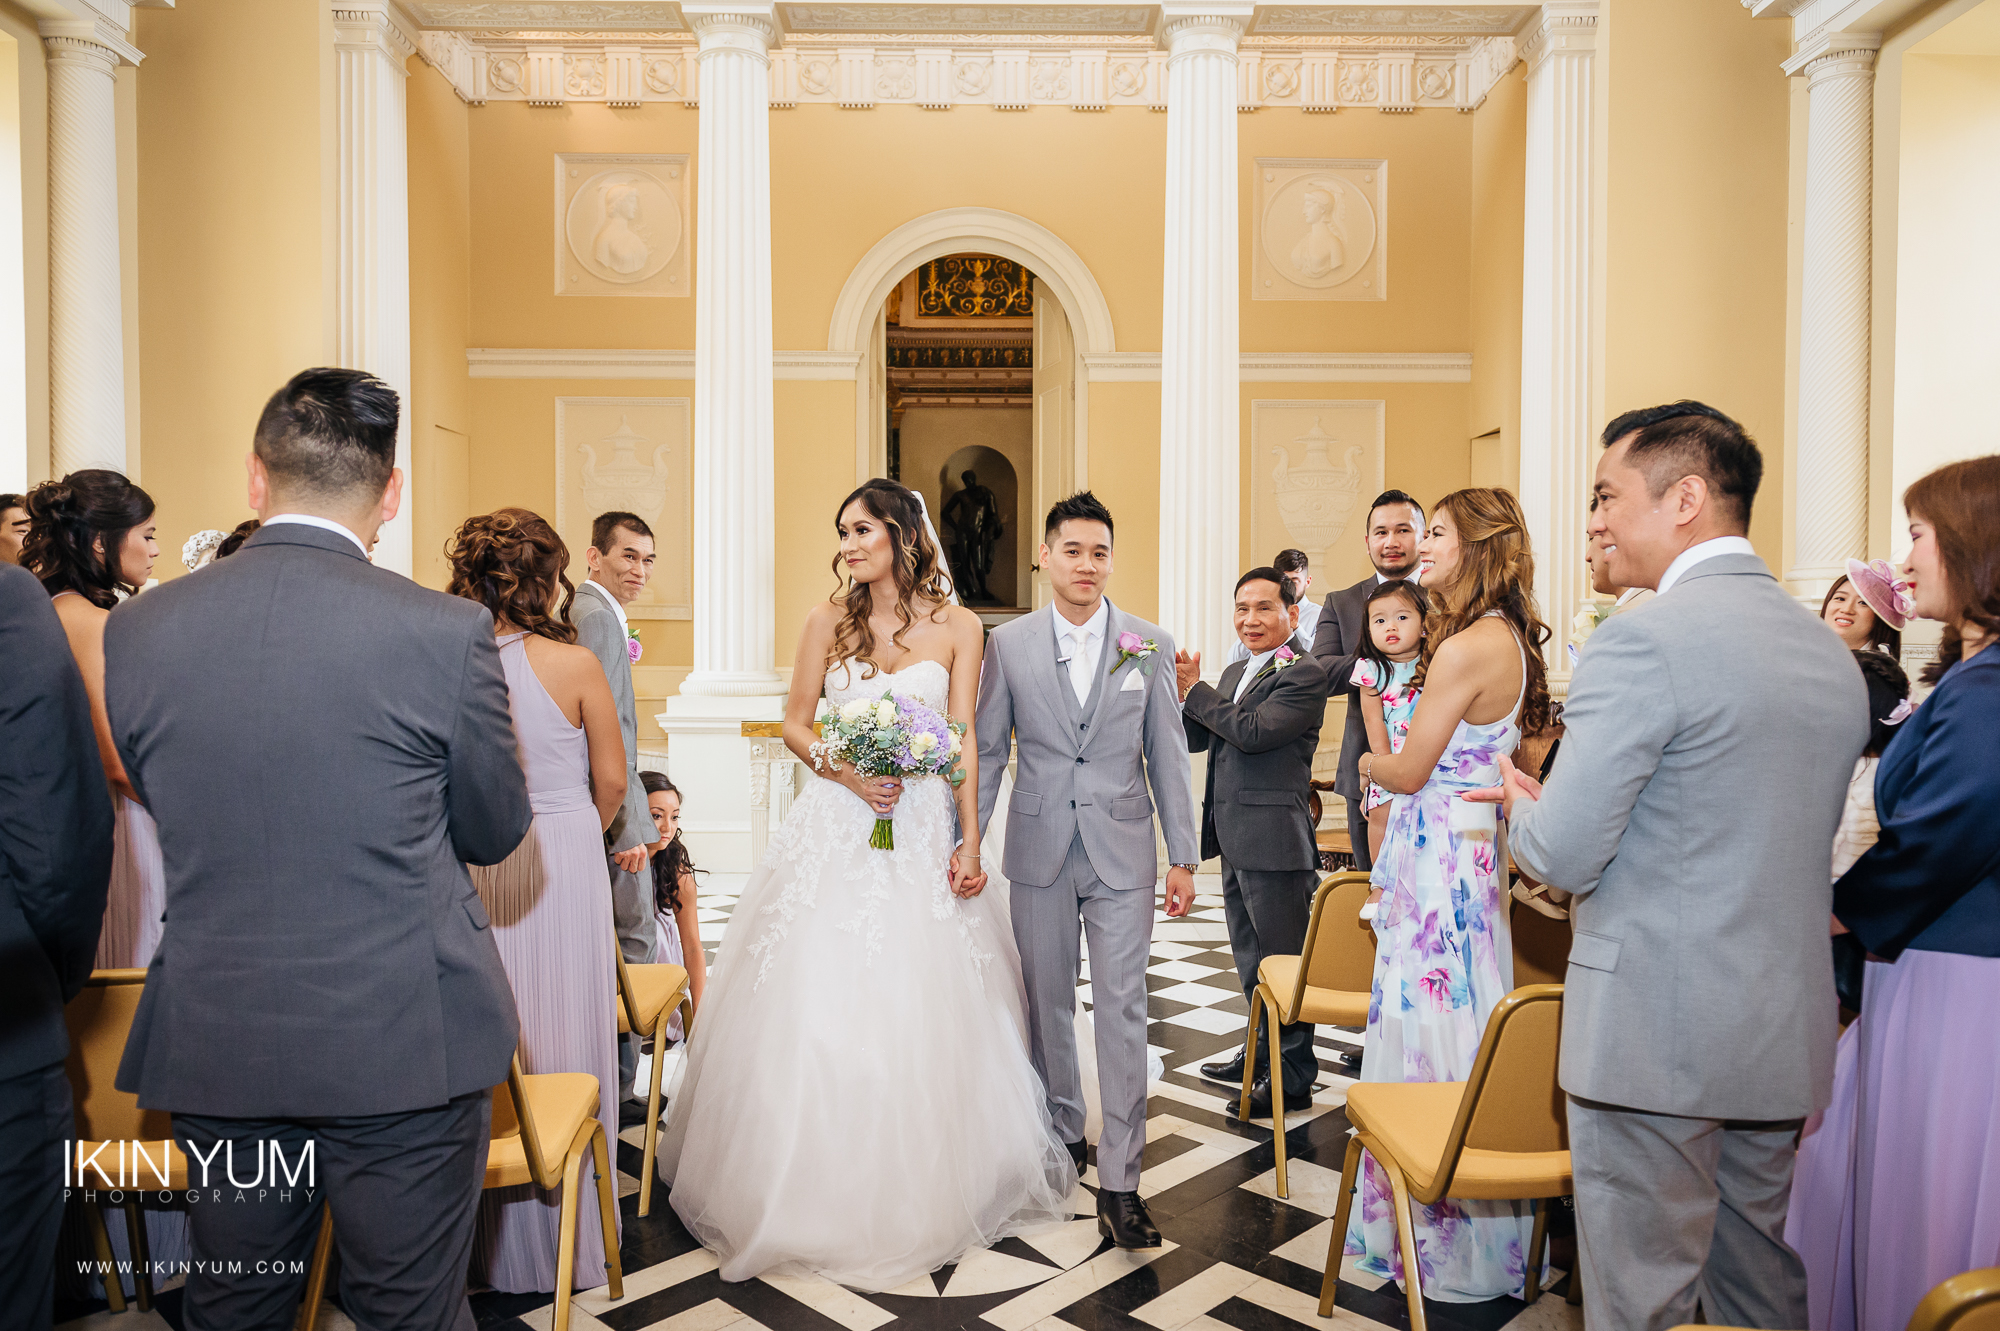 Syon Park Wedding - Ikin Yum Photography -066.jpg